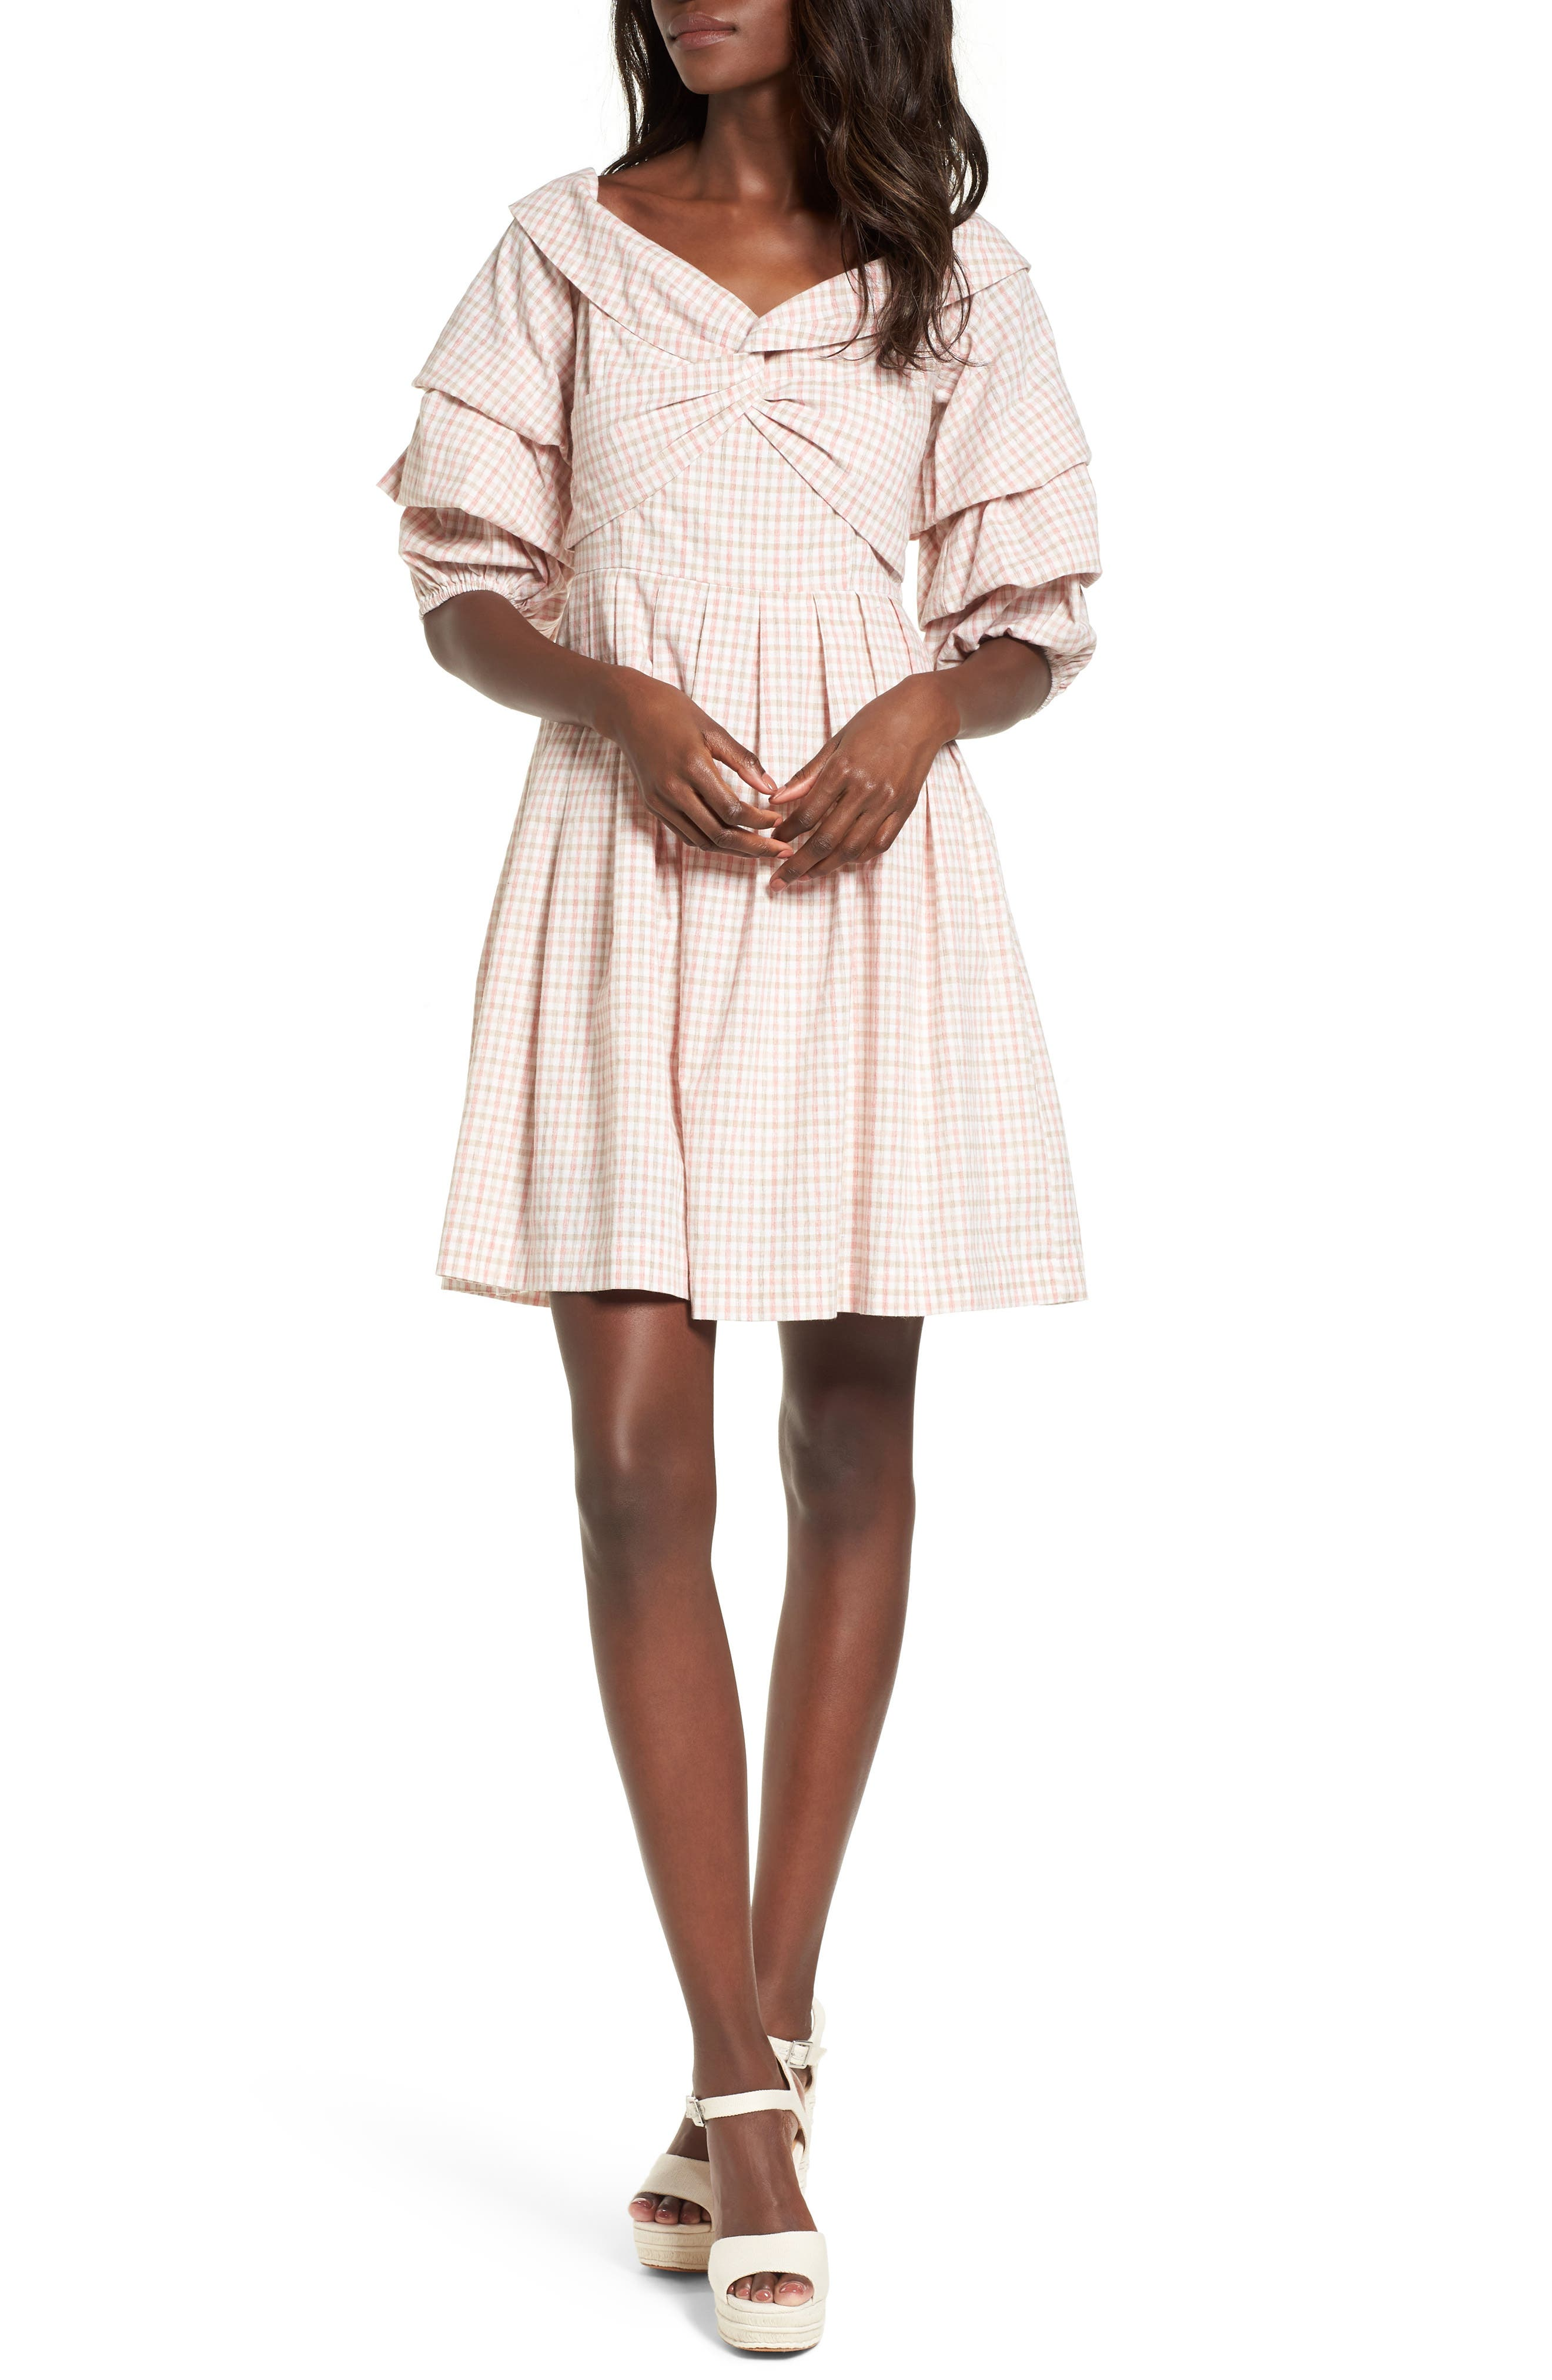 Main Image - Chriselle x J.O.A. Tiered Sleeve Minidress